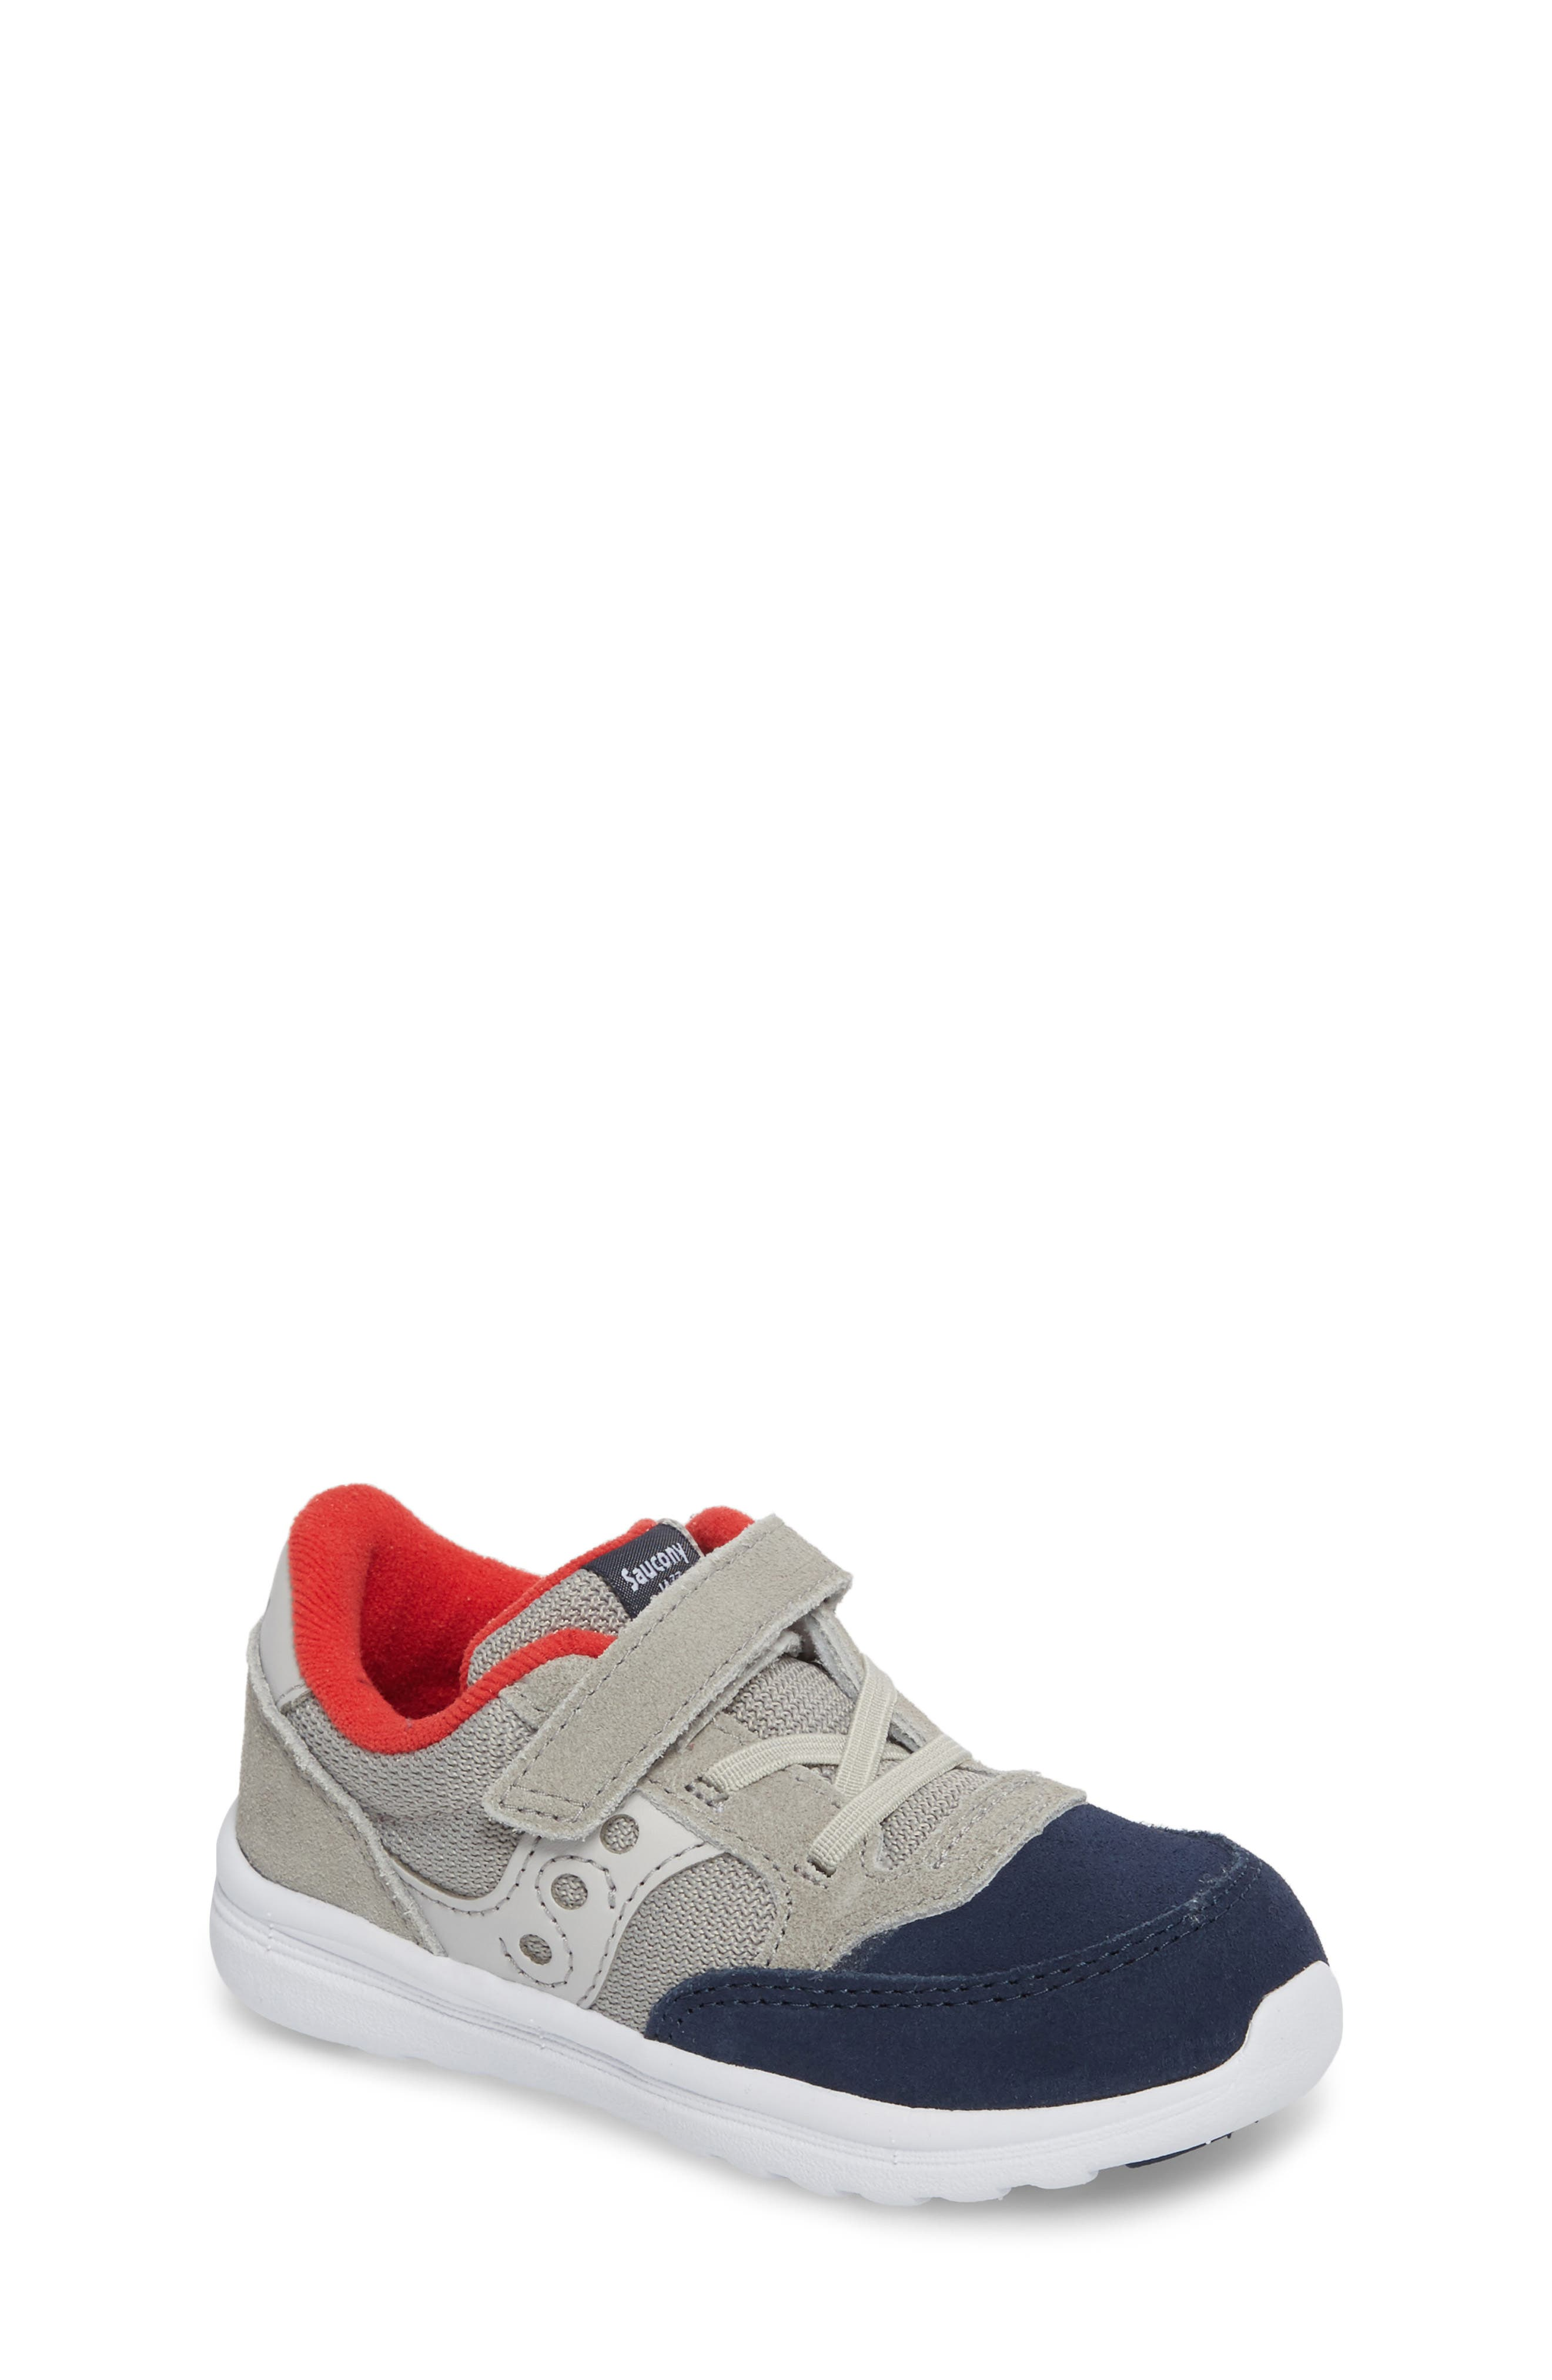 Jazz Lite Sneaker,                             Main thumbnail 1, color,                             020